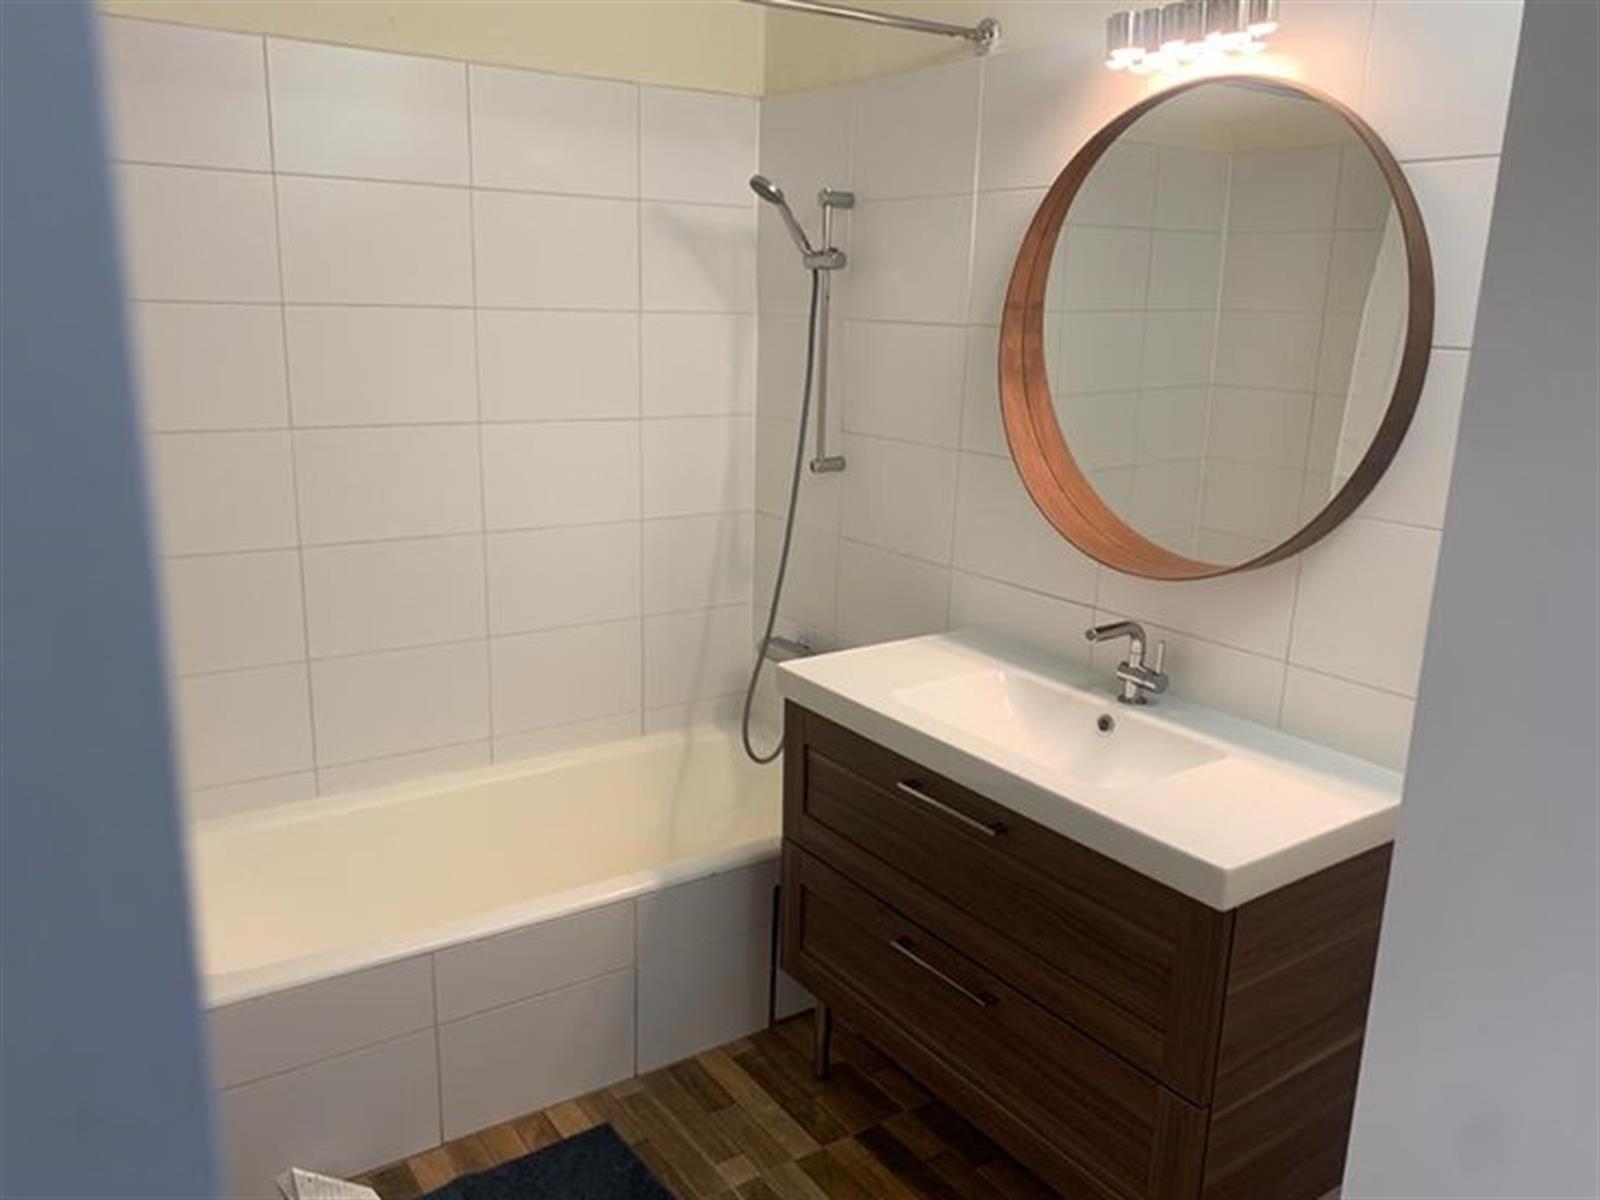 Appartement - Woluwe-Saint-Lambert - #4399349-15